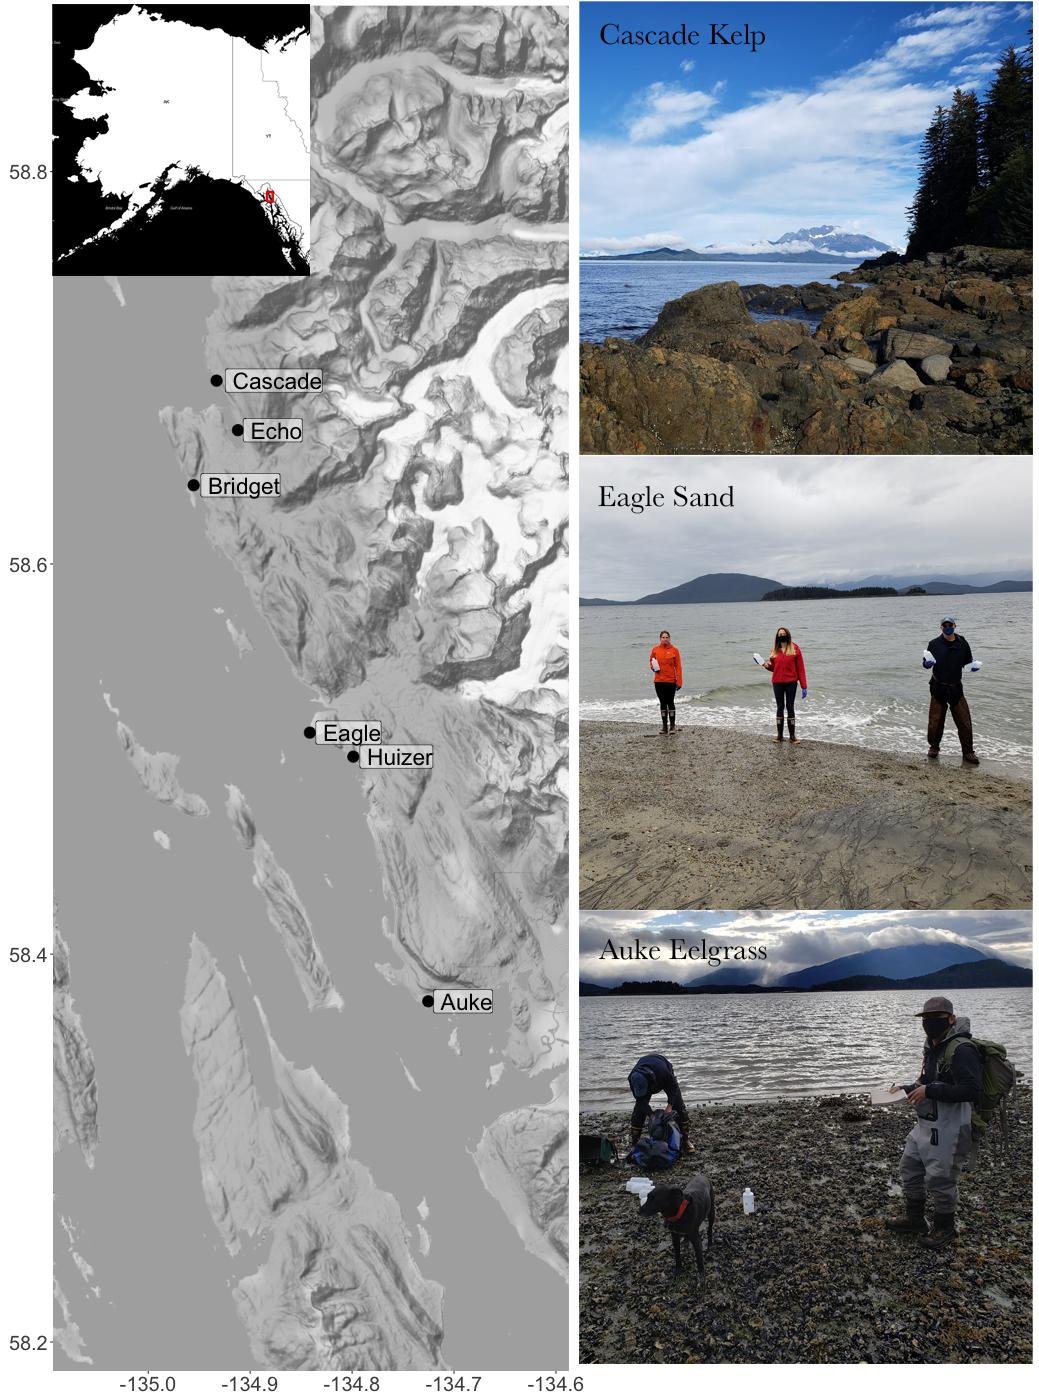 "Map of southeast Alaska sample sites at Cascade, Echo, Bridget, Eagle, Huizer and Auke with three shoreline sample site photos labeled ""Cascade Kelp,"" ""Eagle Sand"" and ""Auke Eelgrass."""